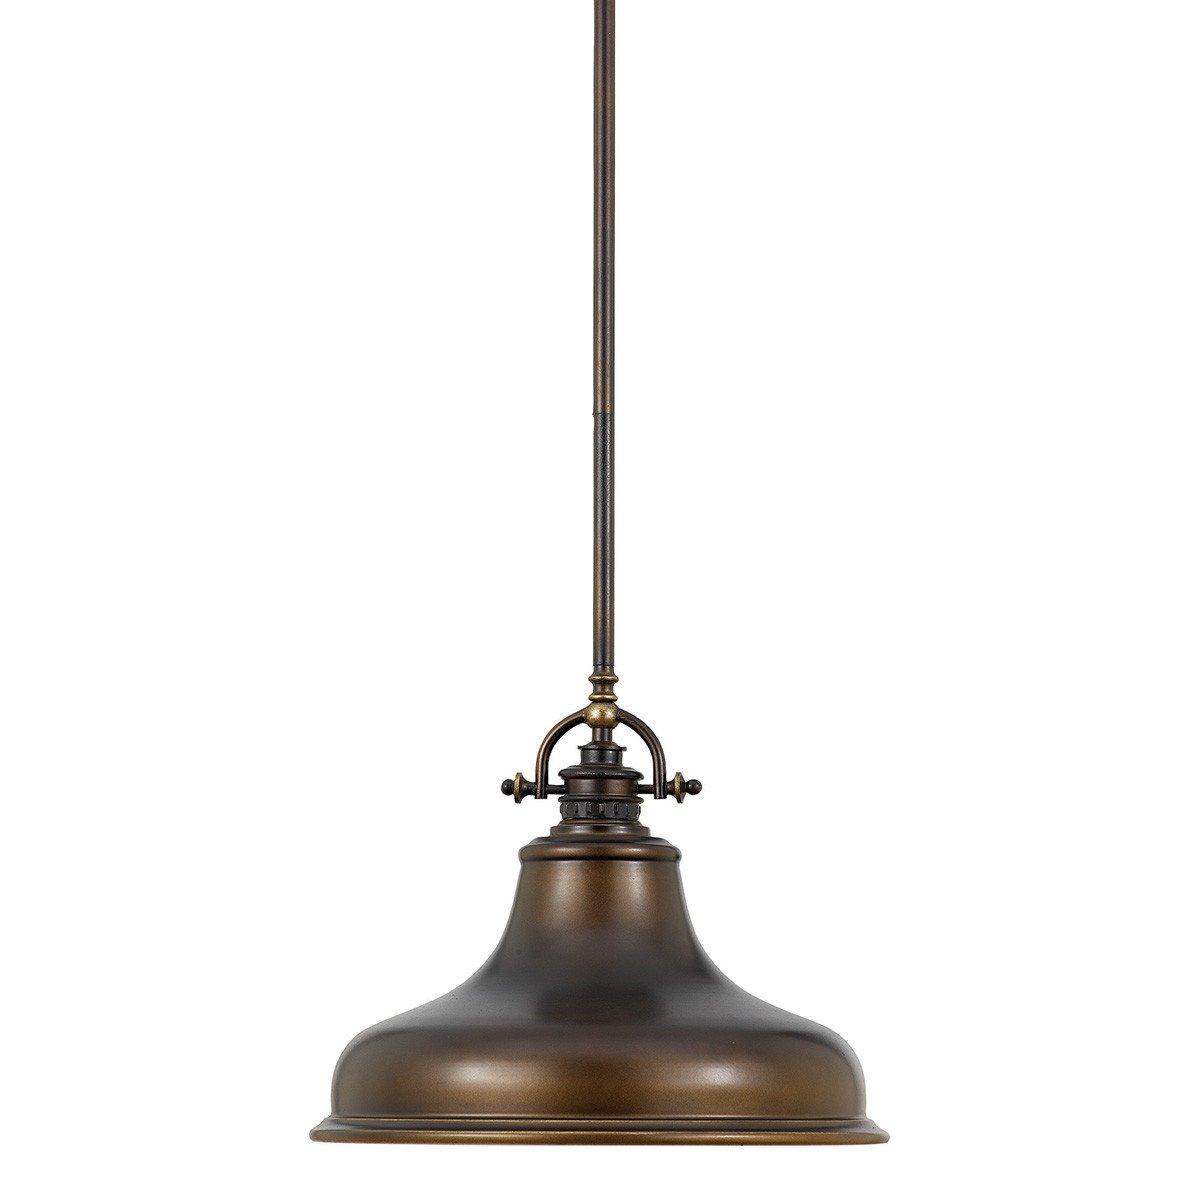 Quoizel (Elstead) Подвесной светильник Emery 1Lt Pendant